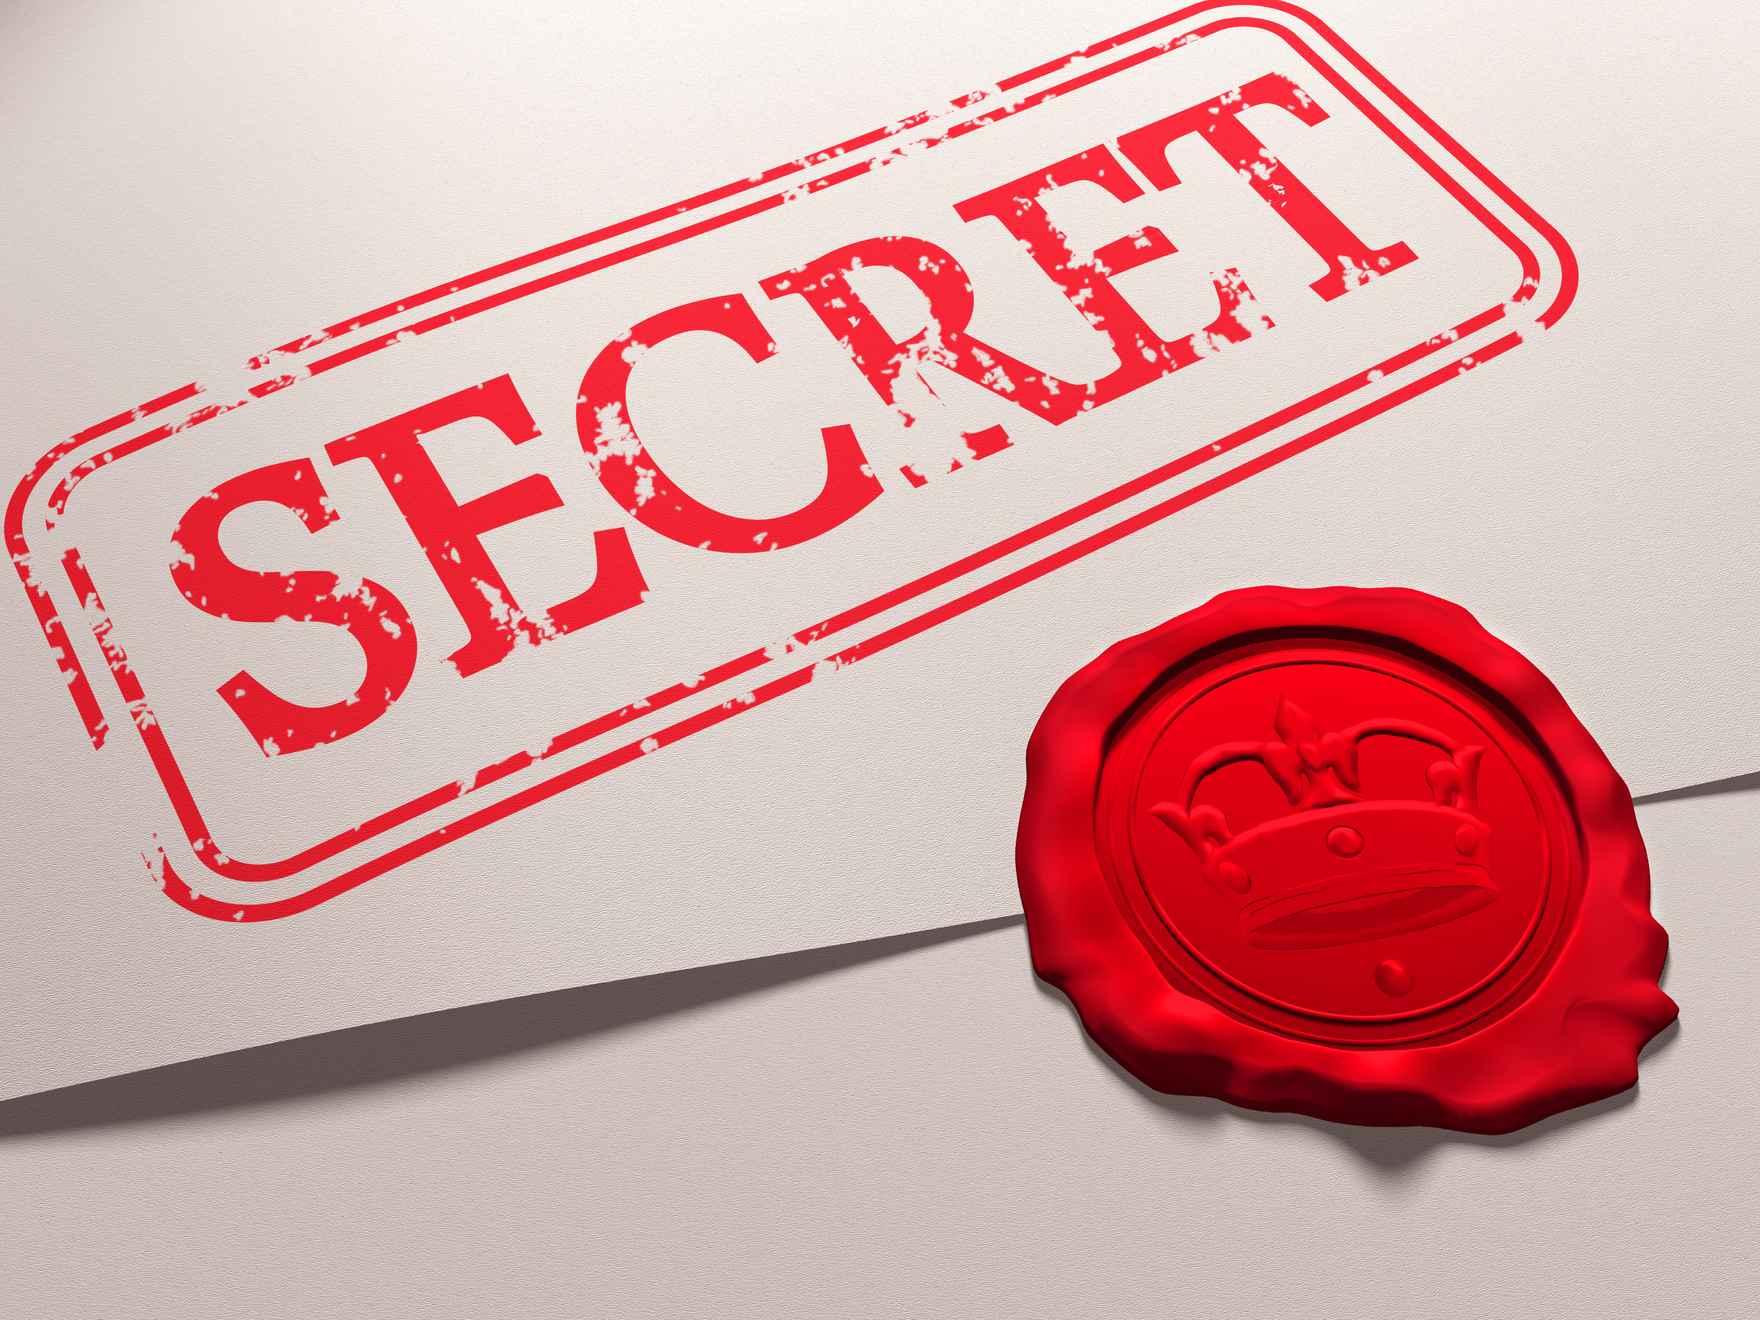 secret_to_investing.jpg